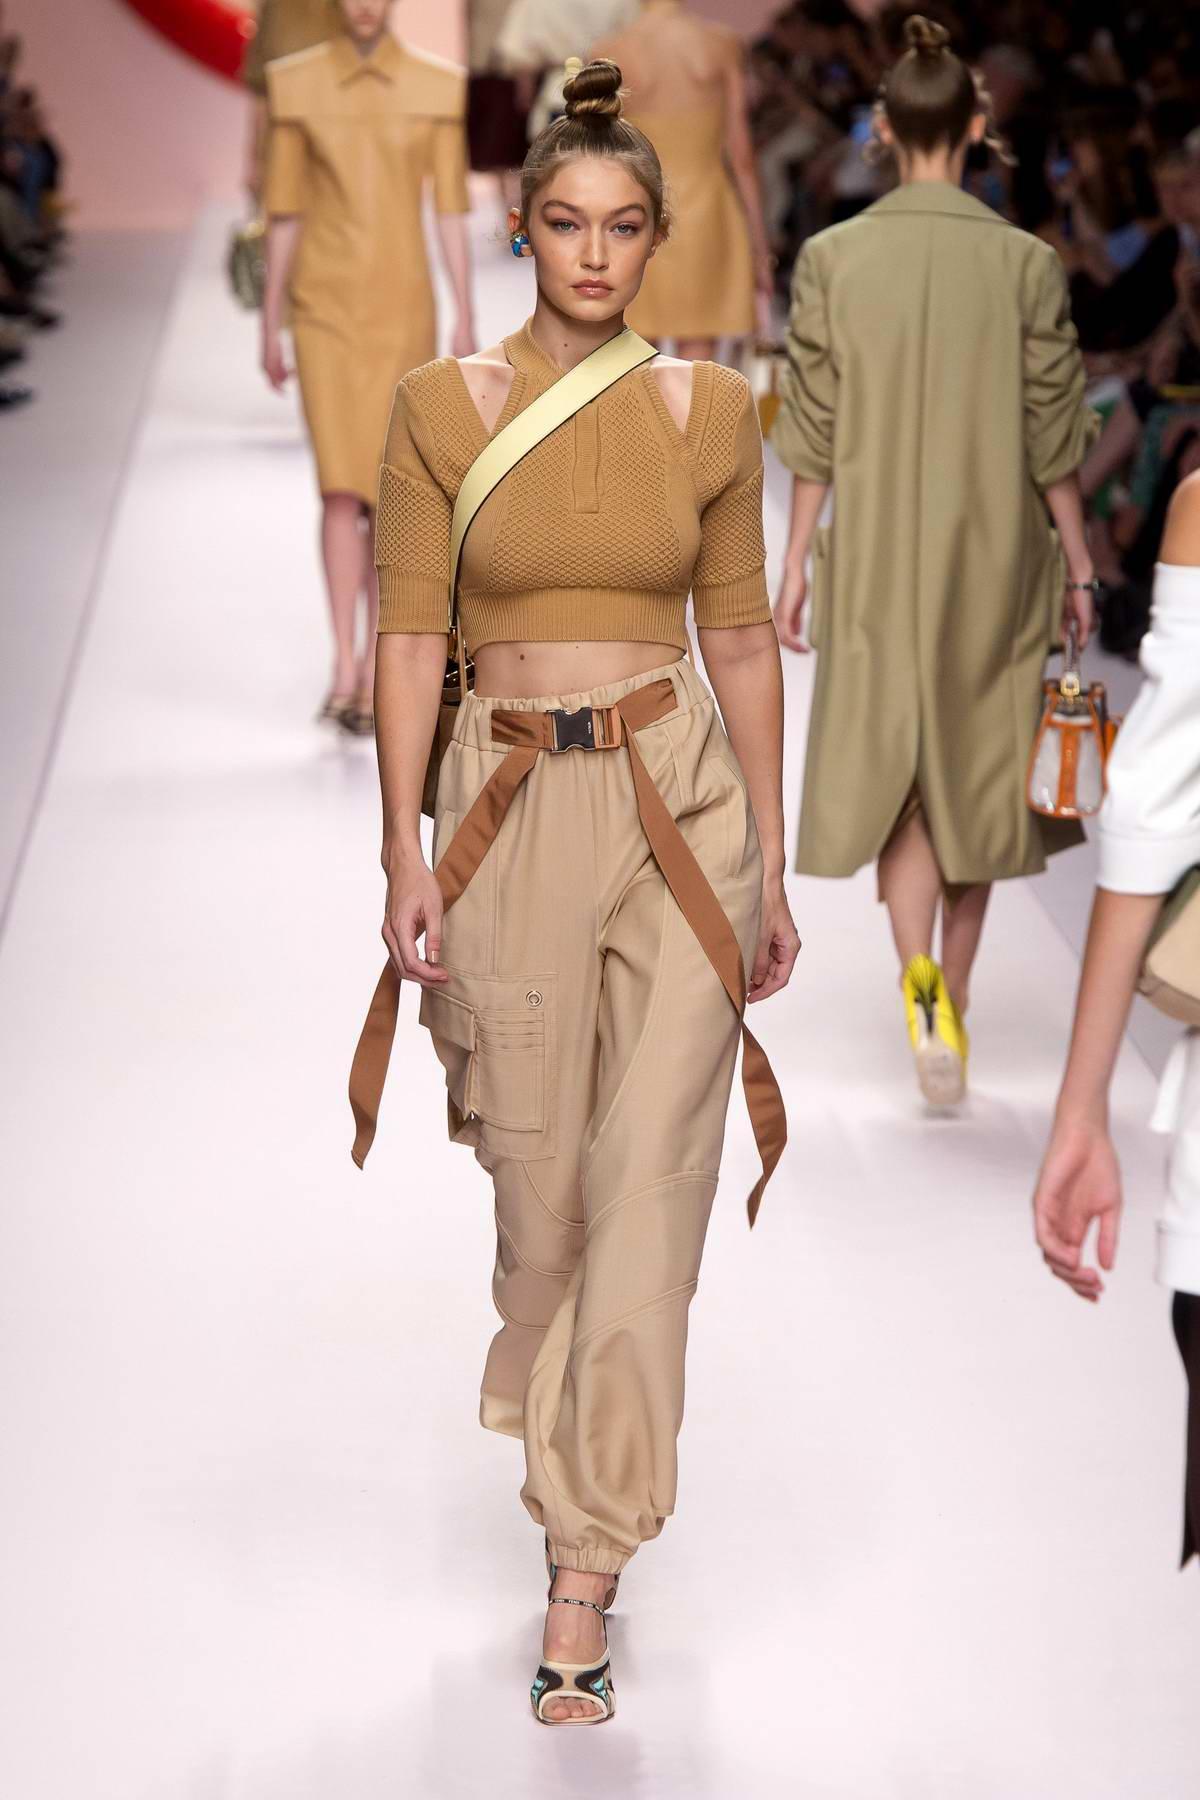 2352780cc83 Gigi Hadid walks the runway for Fendi Fashion Show